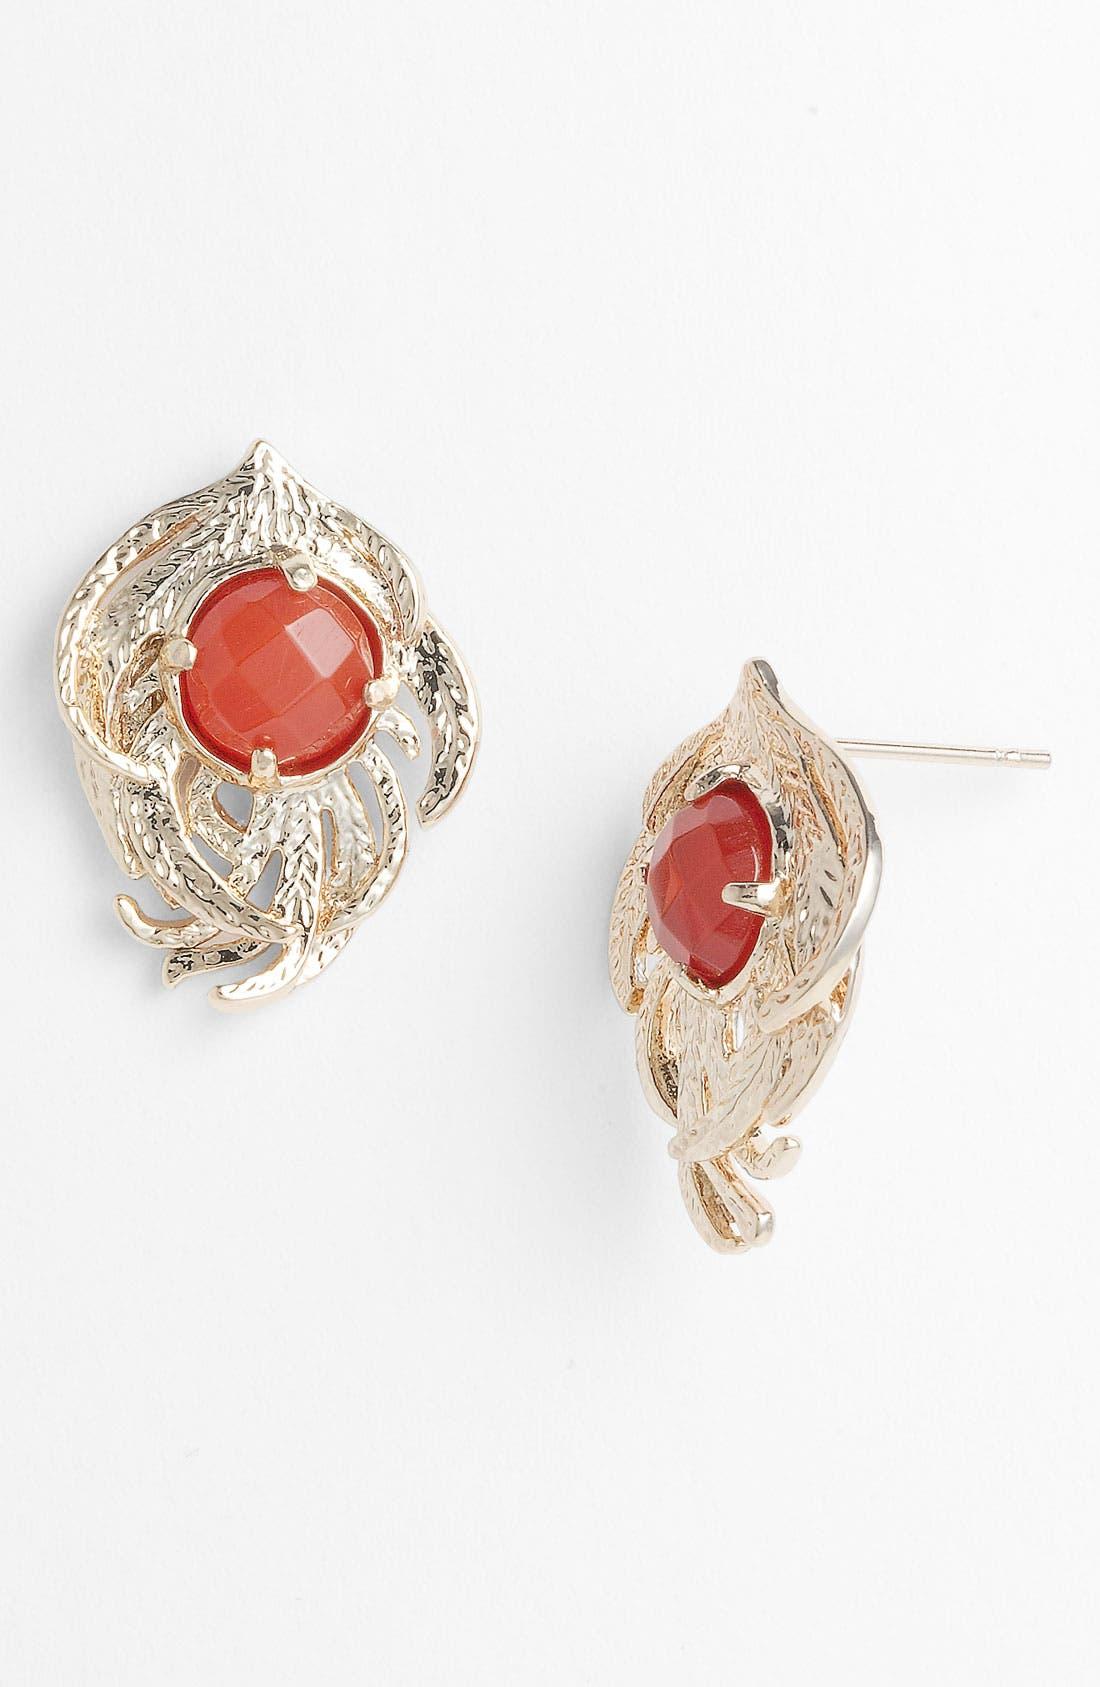 Alternate Image 1 Selected - Kendra Scott 'Hailey' Stud Earrings